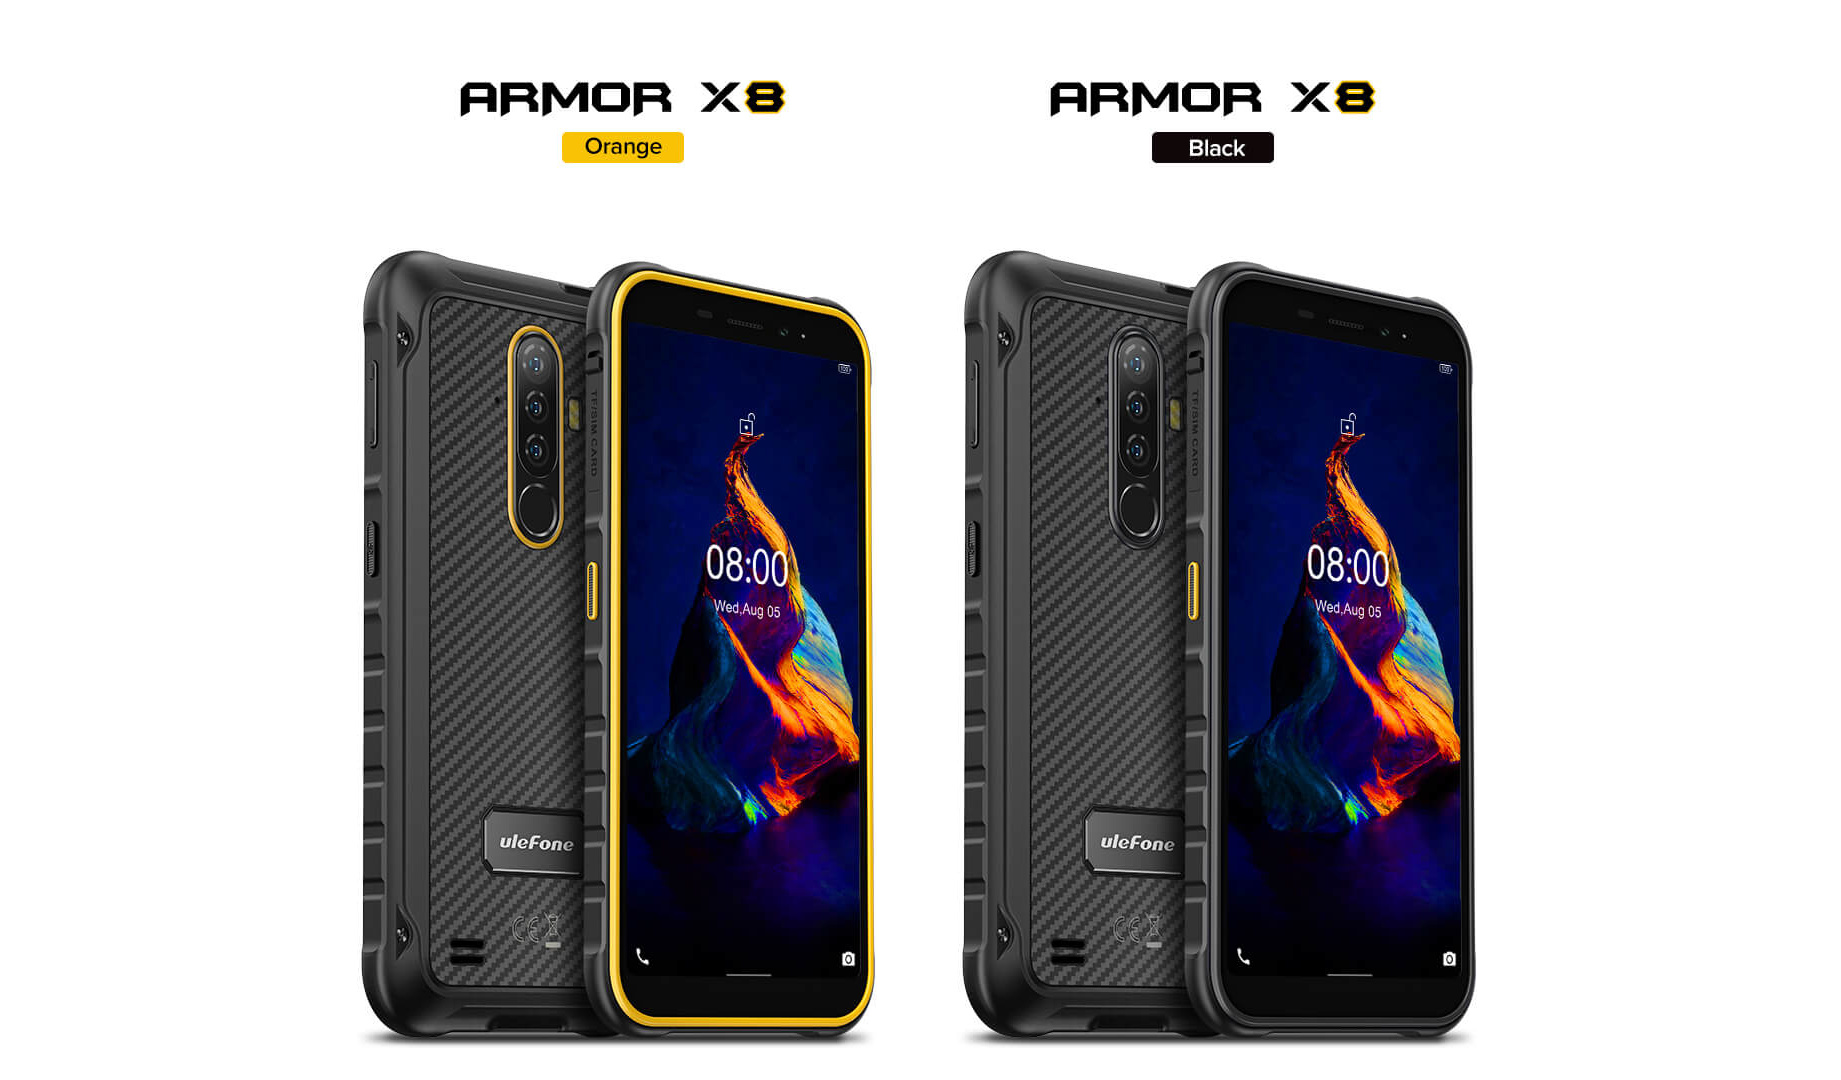 Ulefone Armor X8 1 1841x1080x